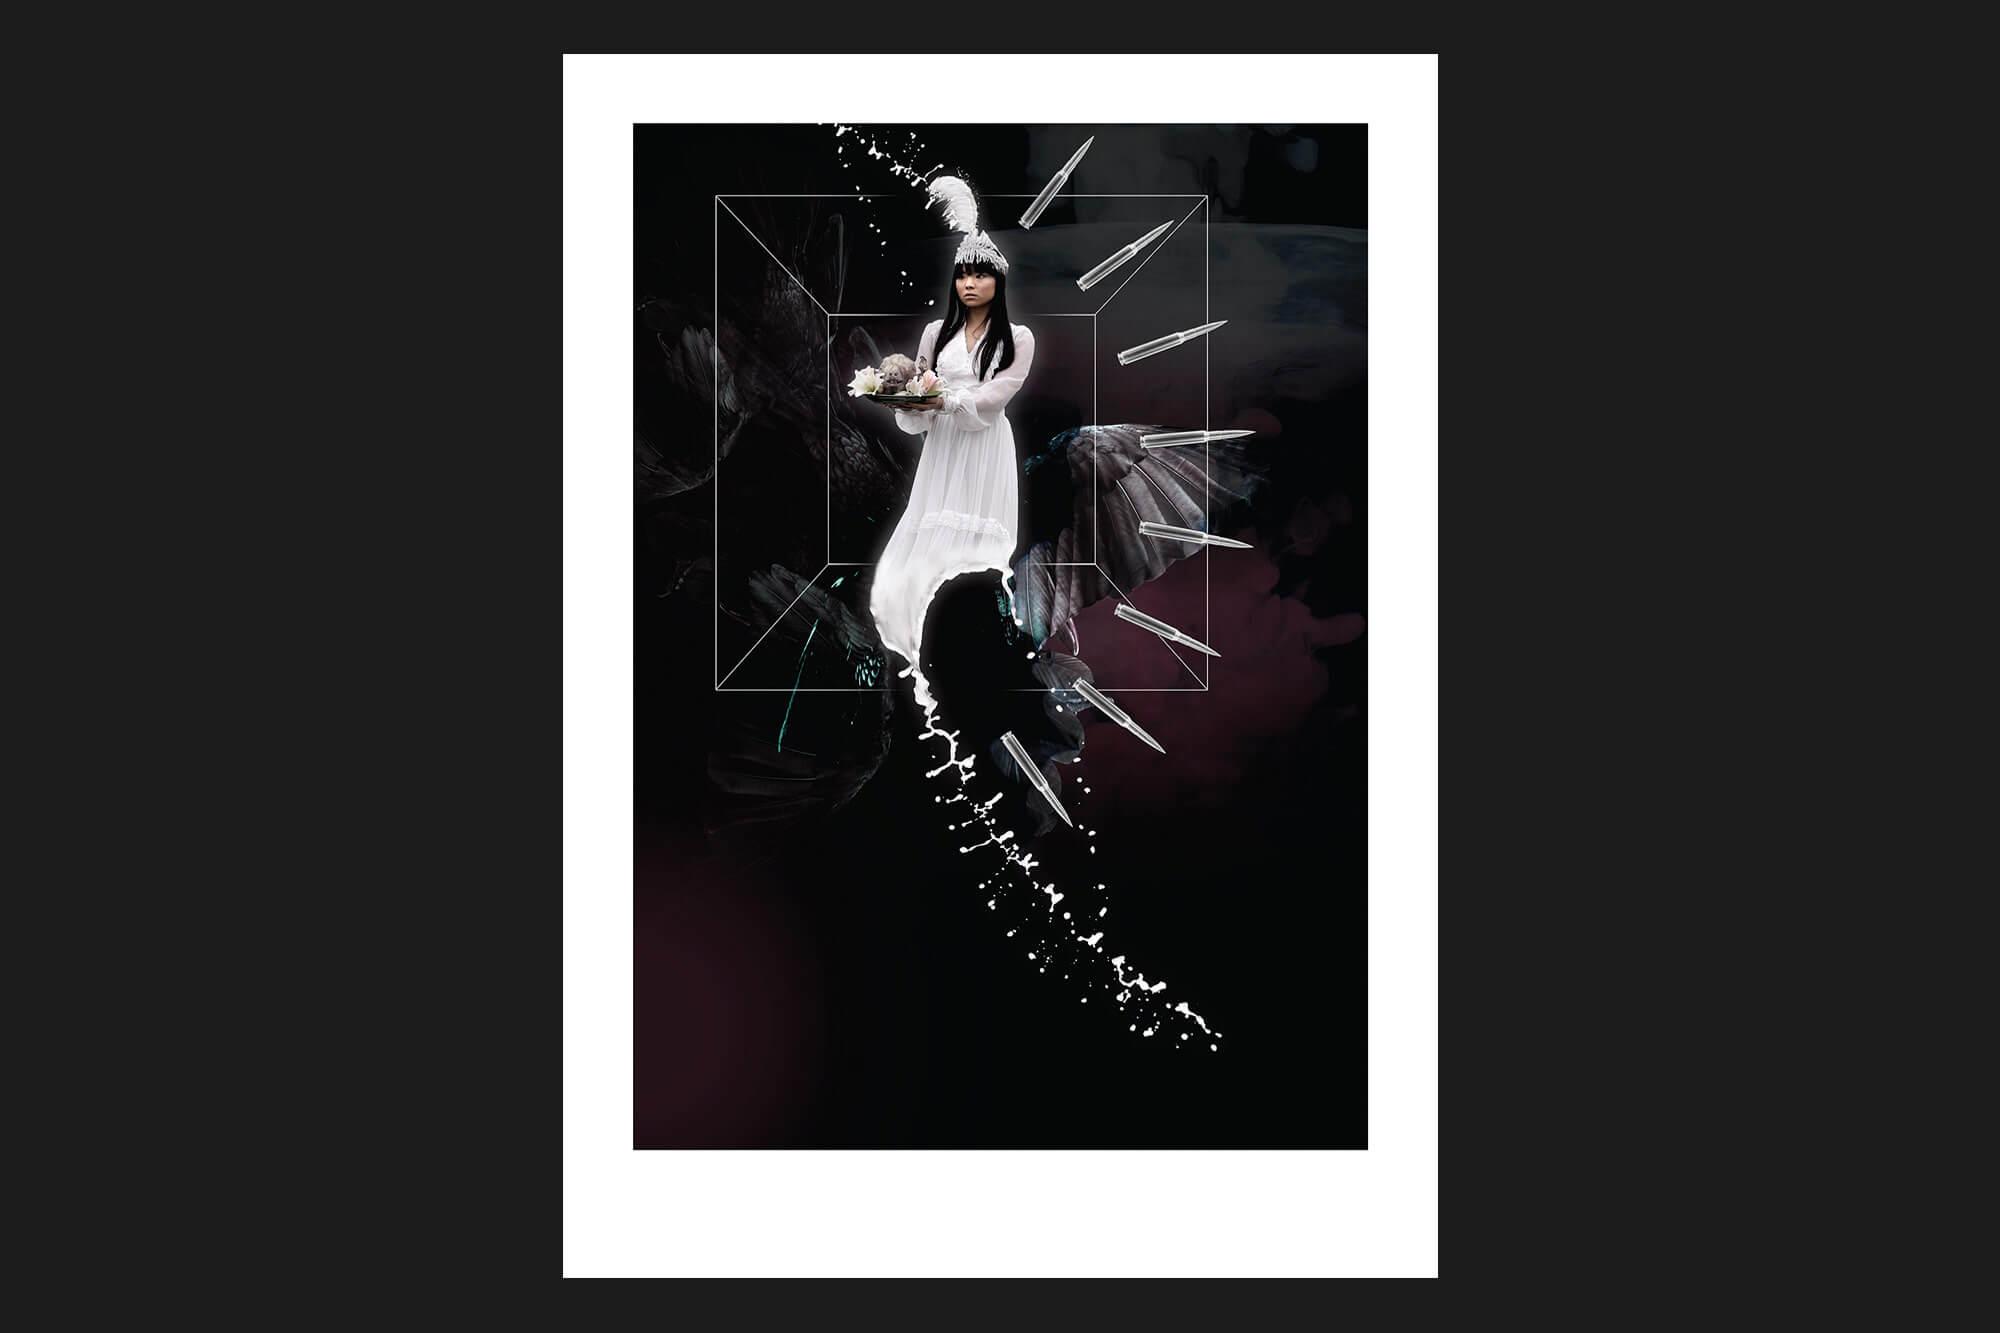 gareth-paul-jones-studio-design-neringa-rekasiute-photography-7788-art-identity-series-cs-06